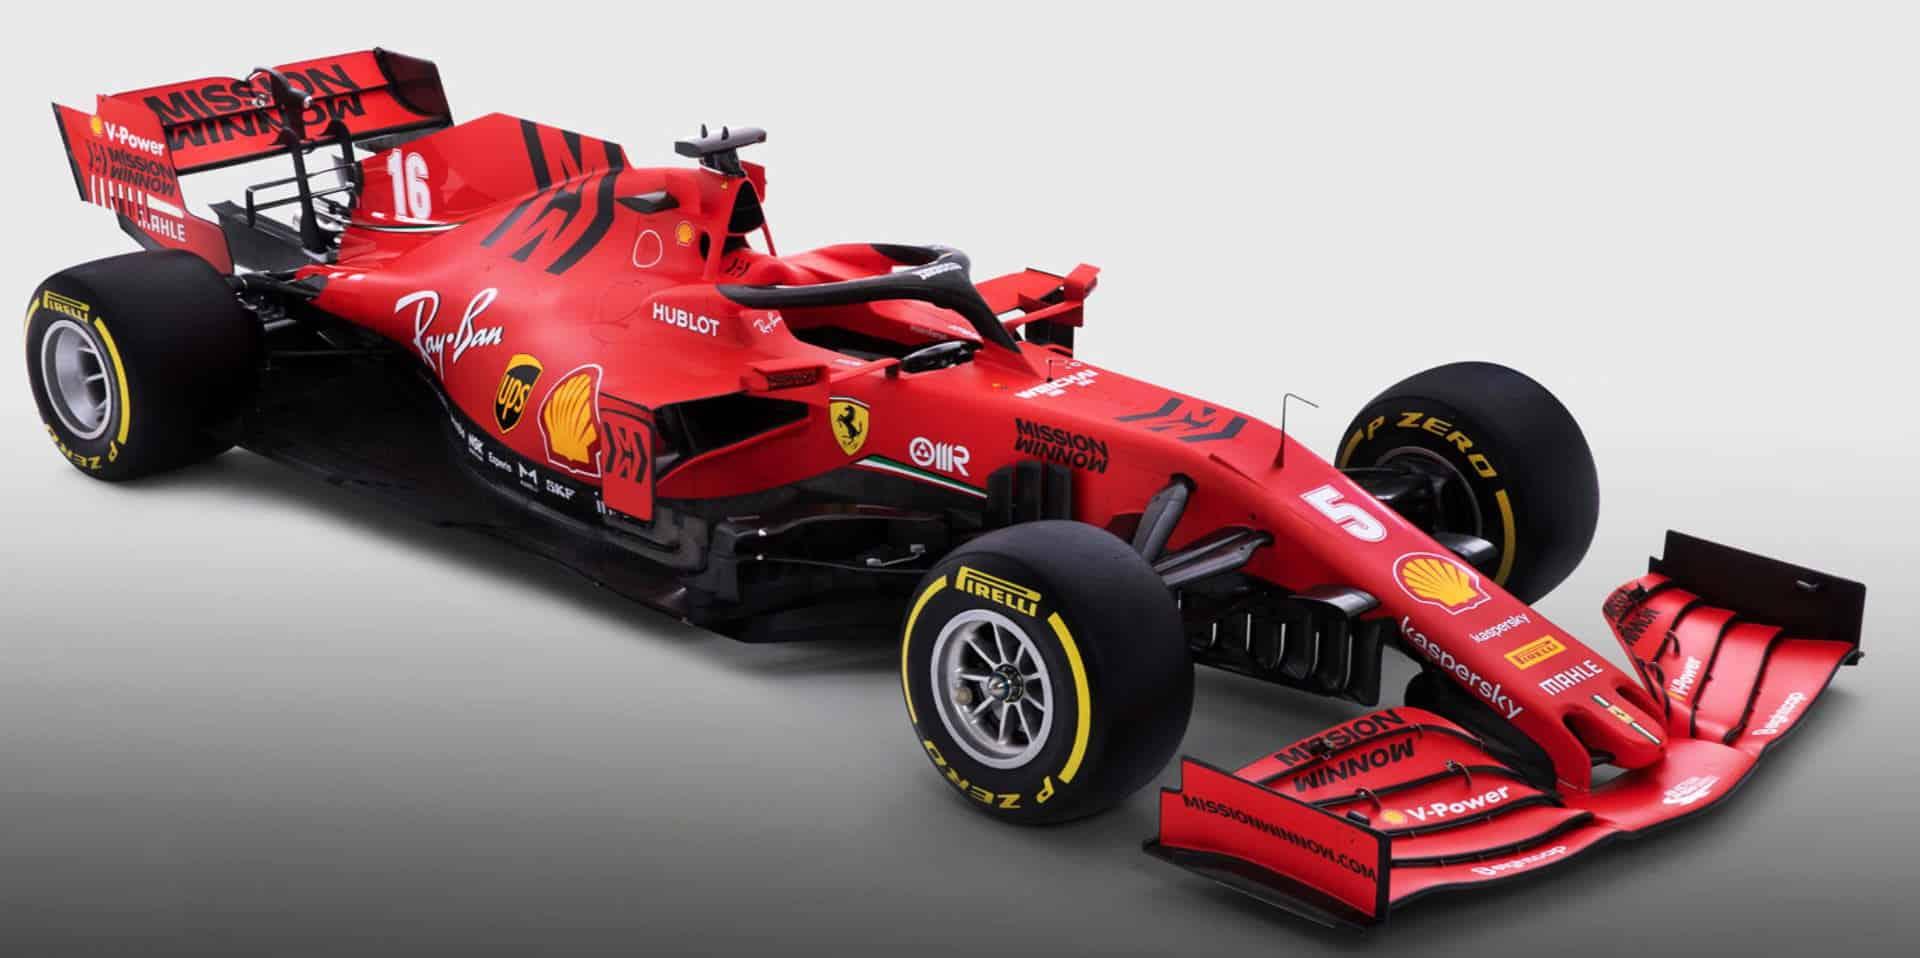 Ferrari F1 SF1000 2020 car studio photo side angle Photo Ferrari